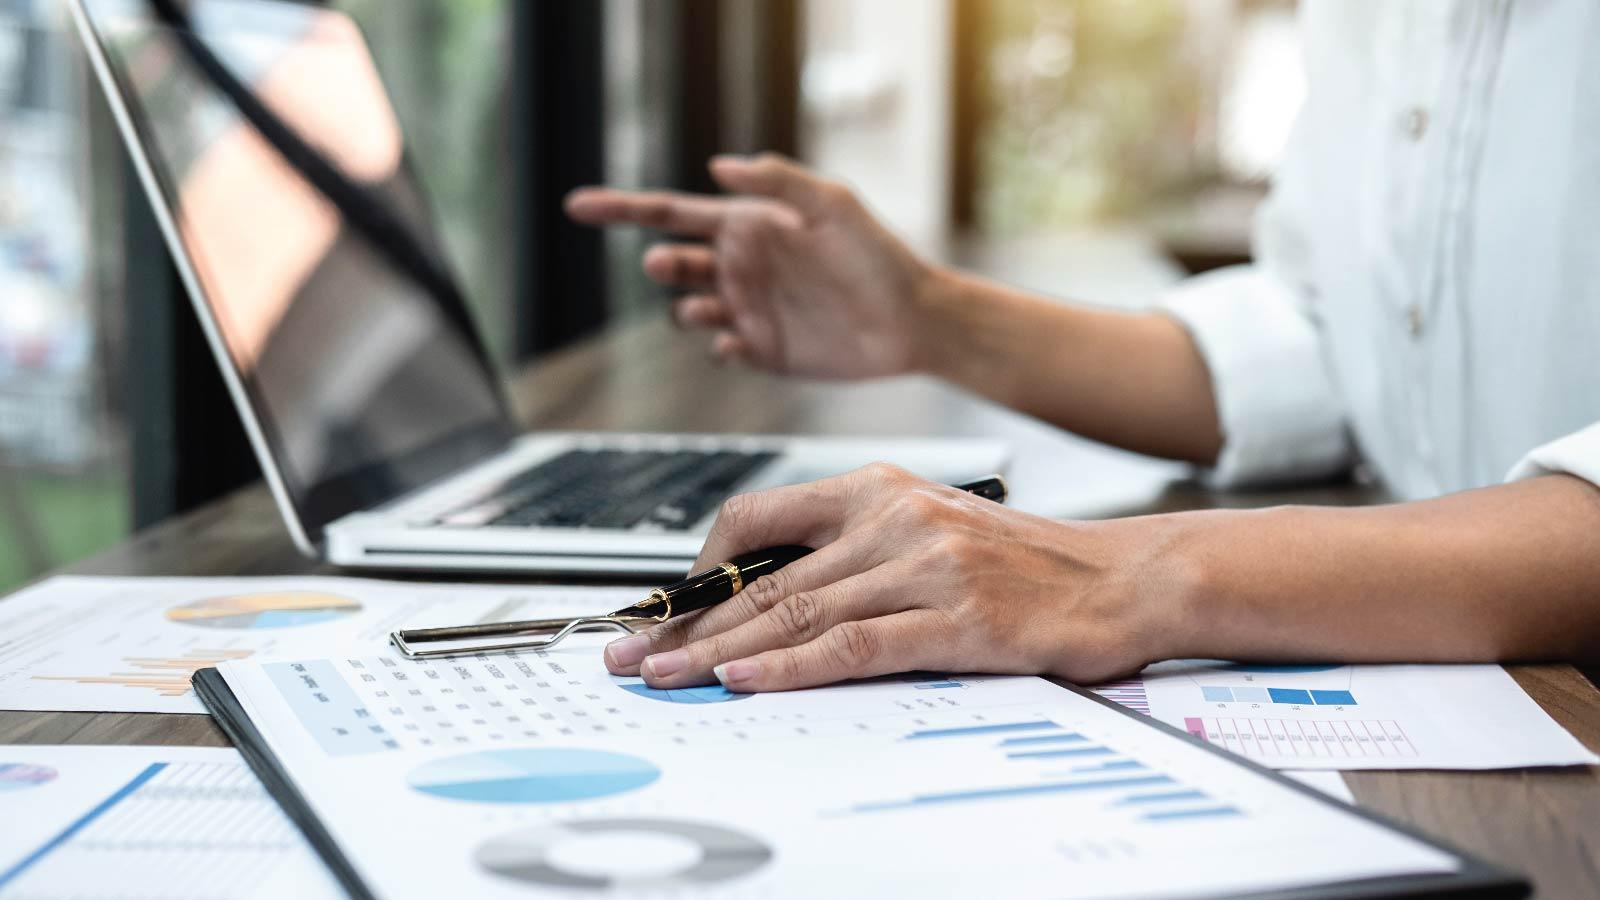 Top 4 Ways CIOs can Slash IT Budgets